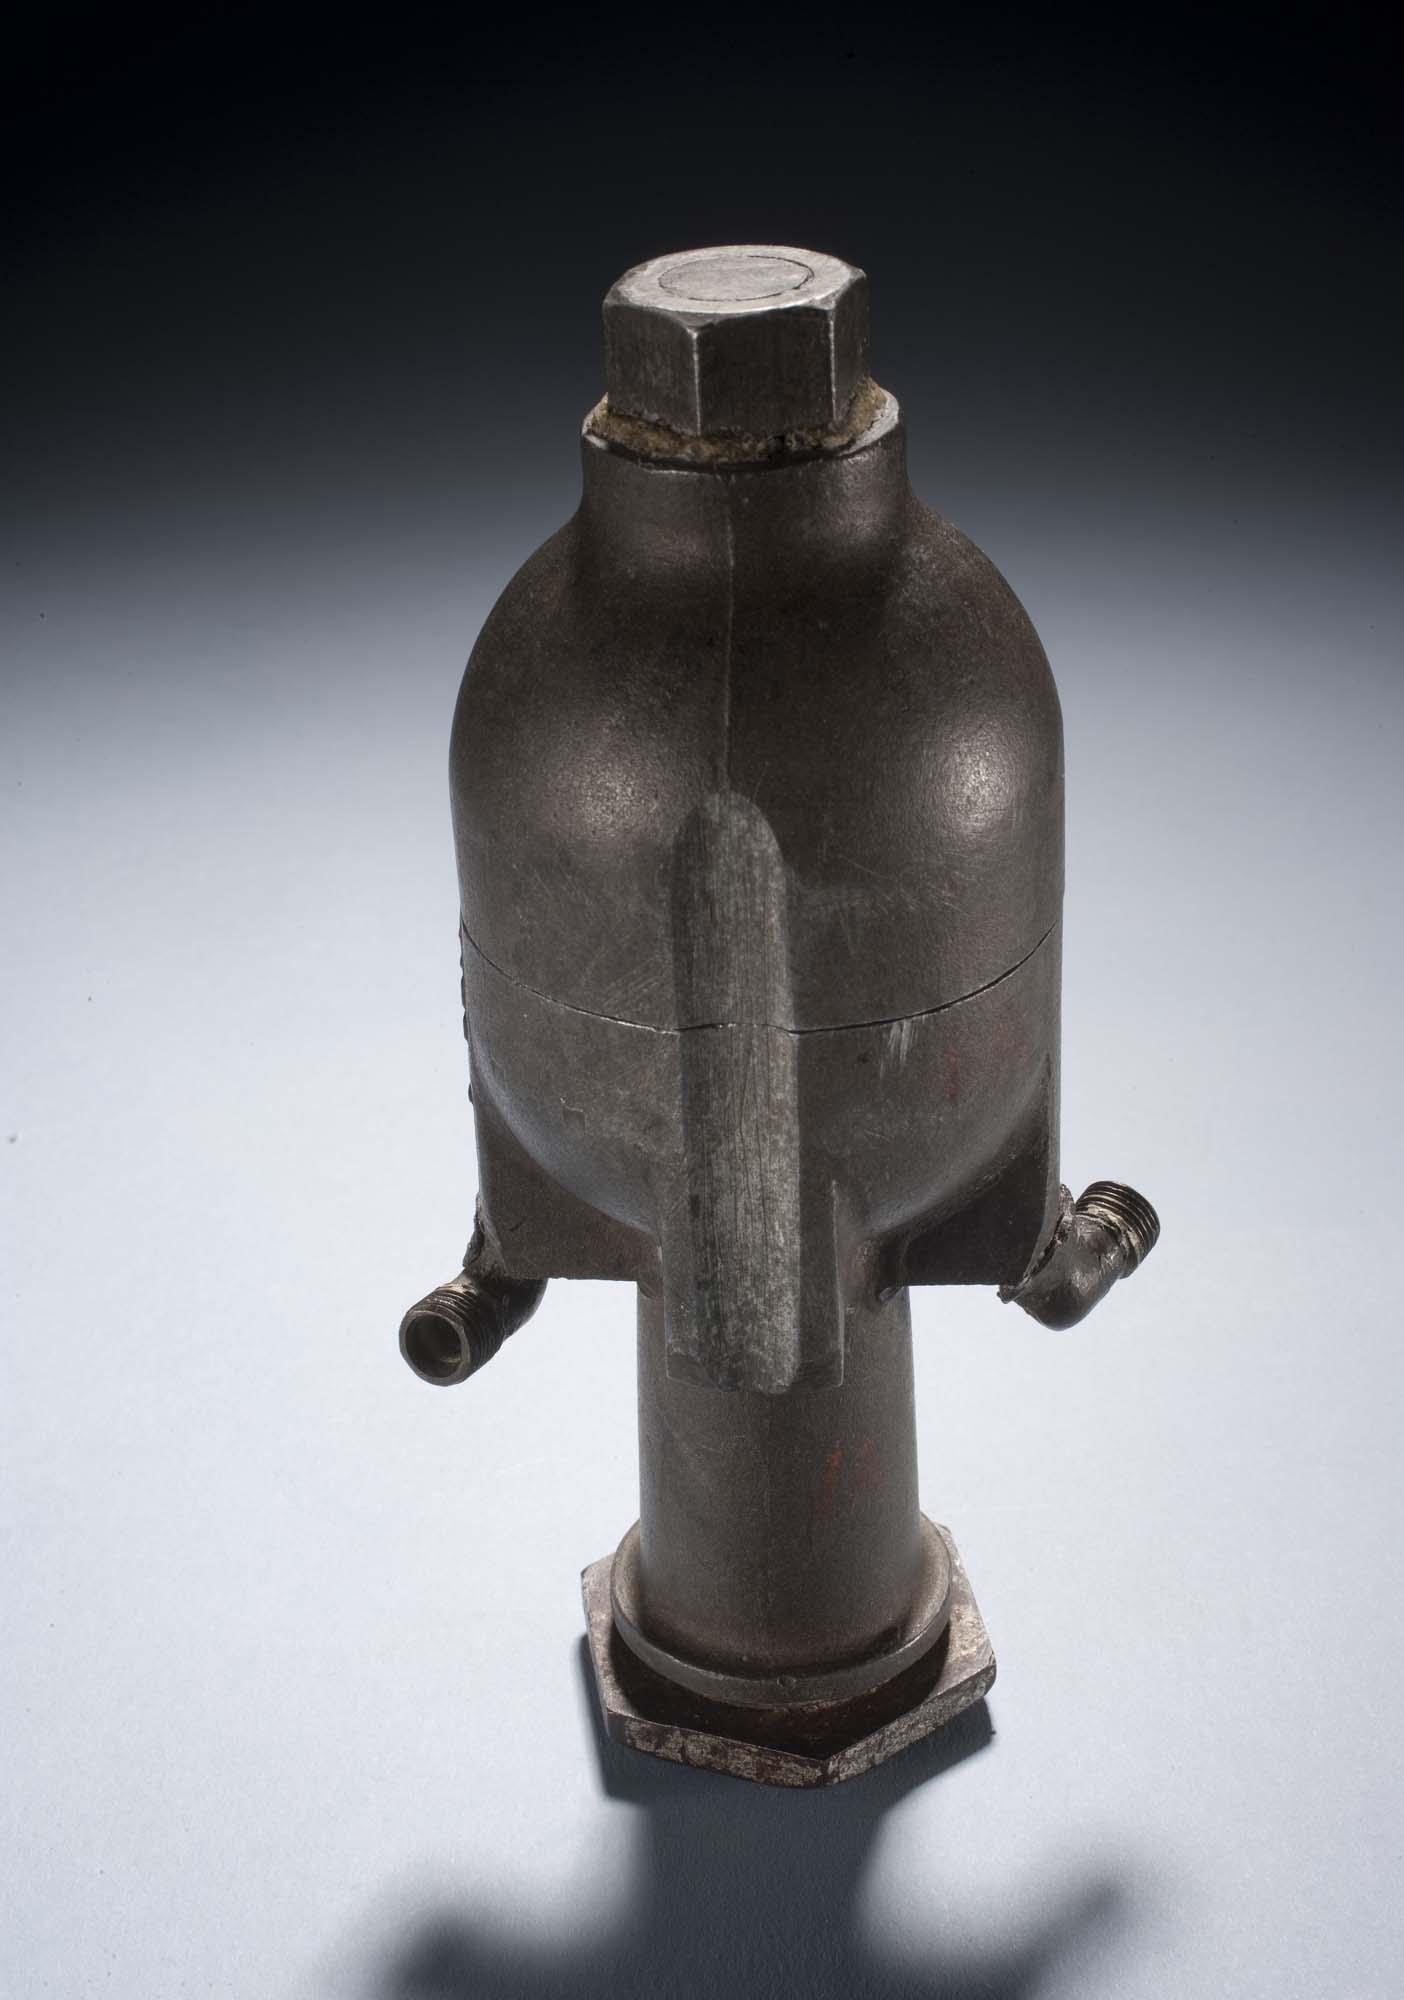 AIS (ARS) Rocket Motor No. 1 & 2